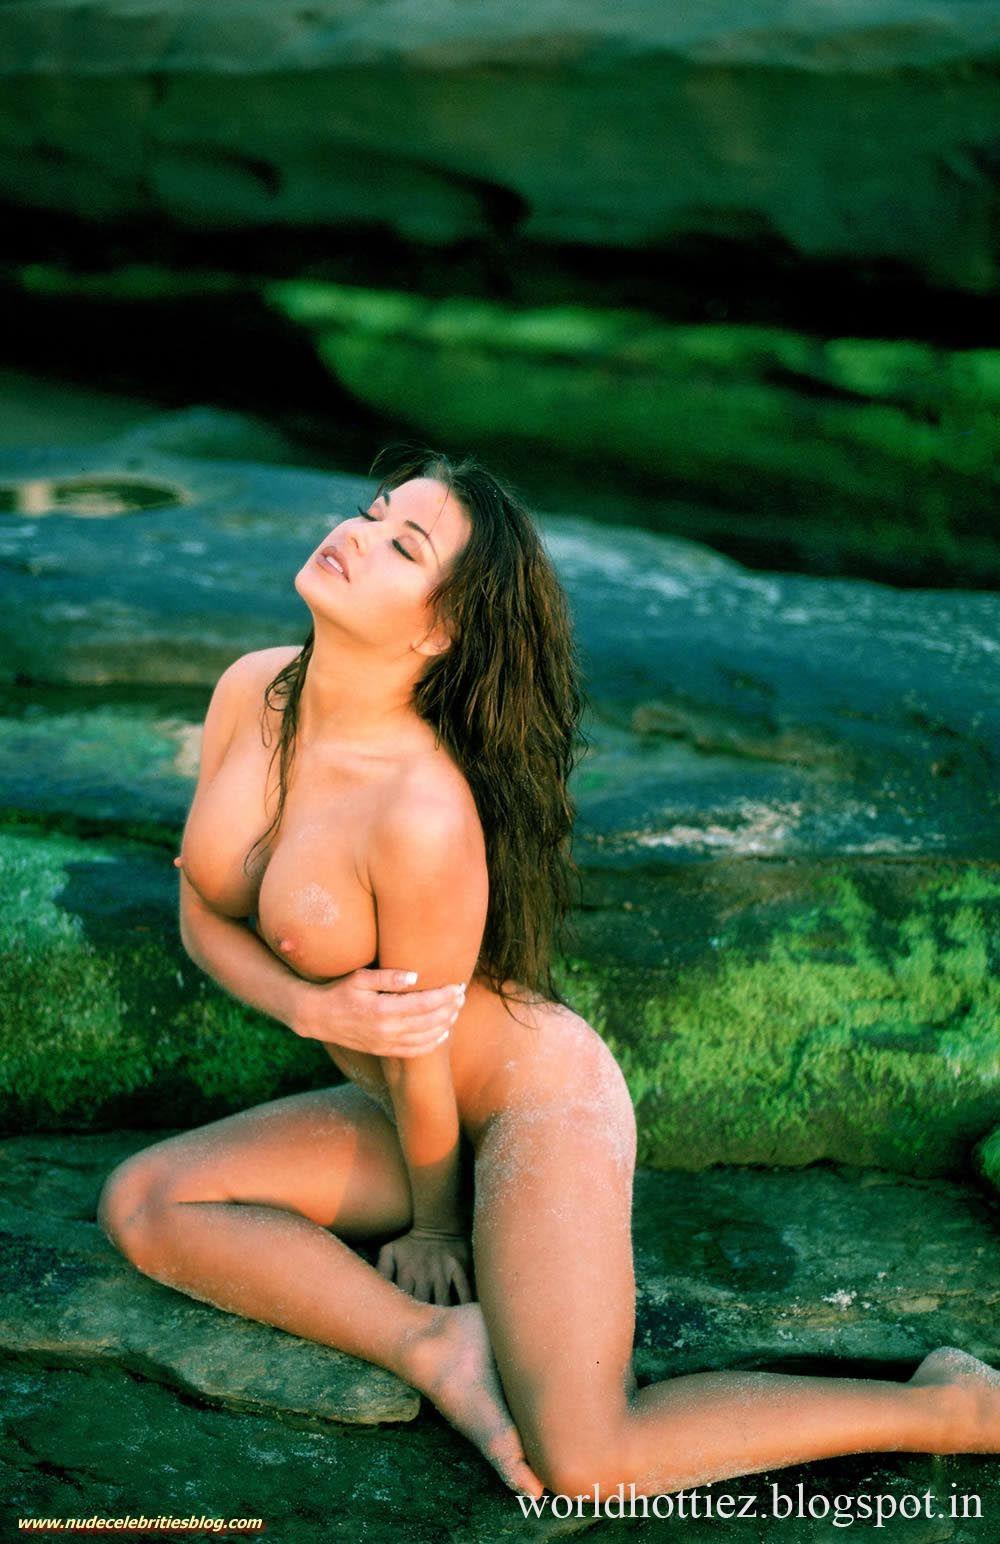 Creampie bangbros free porn pics